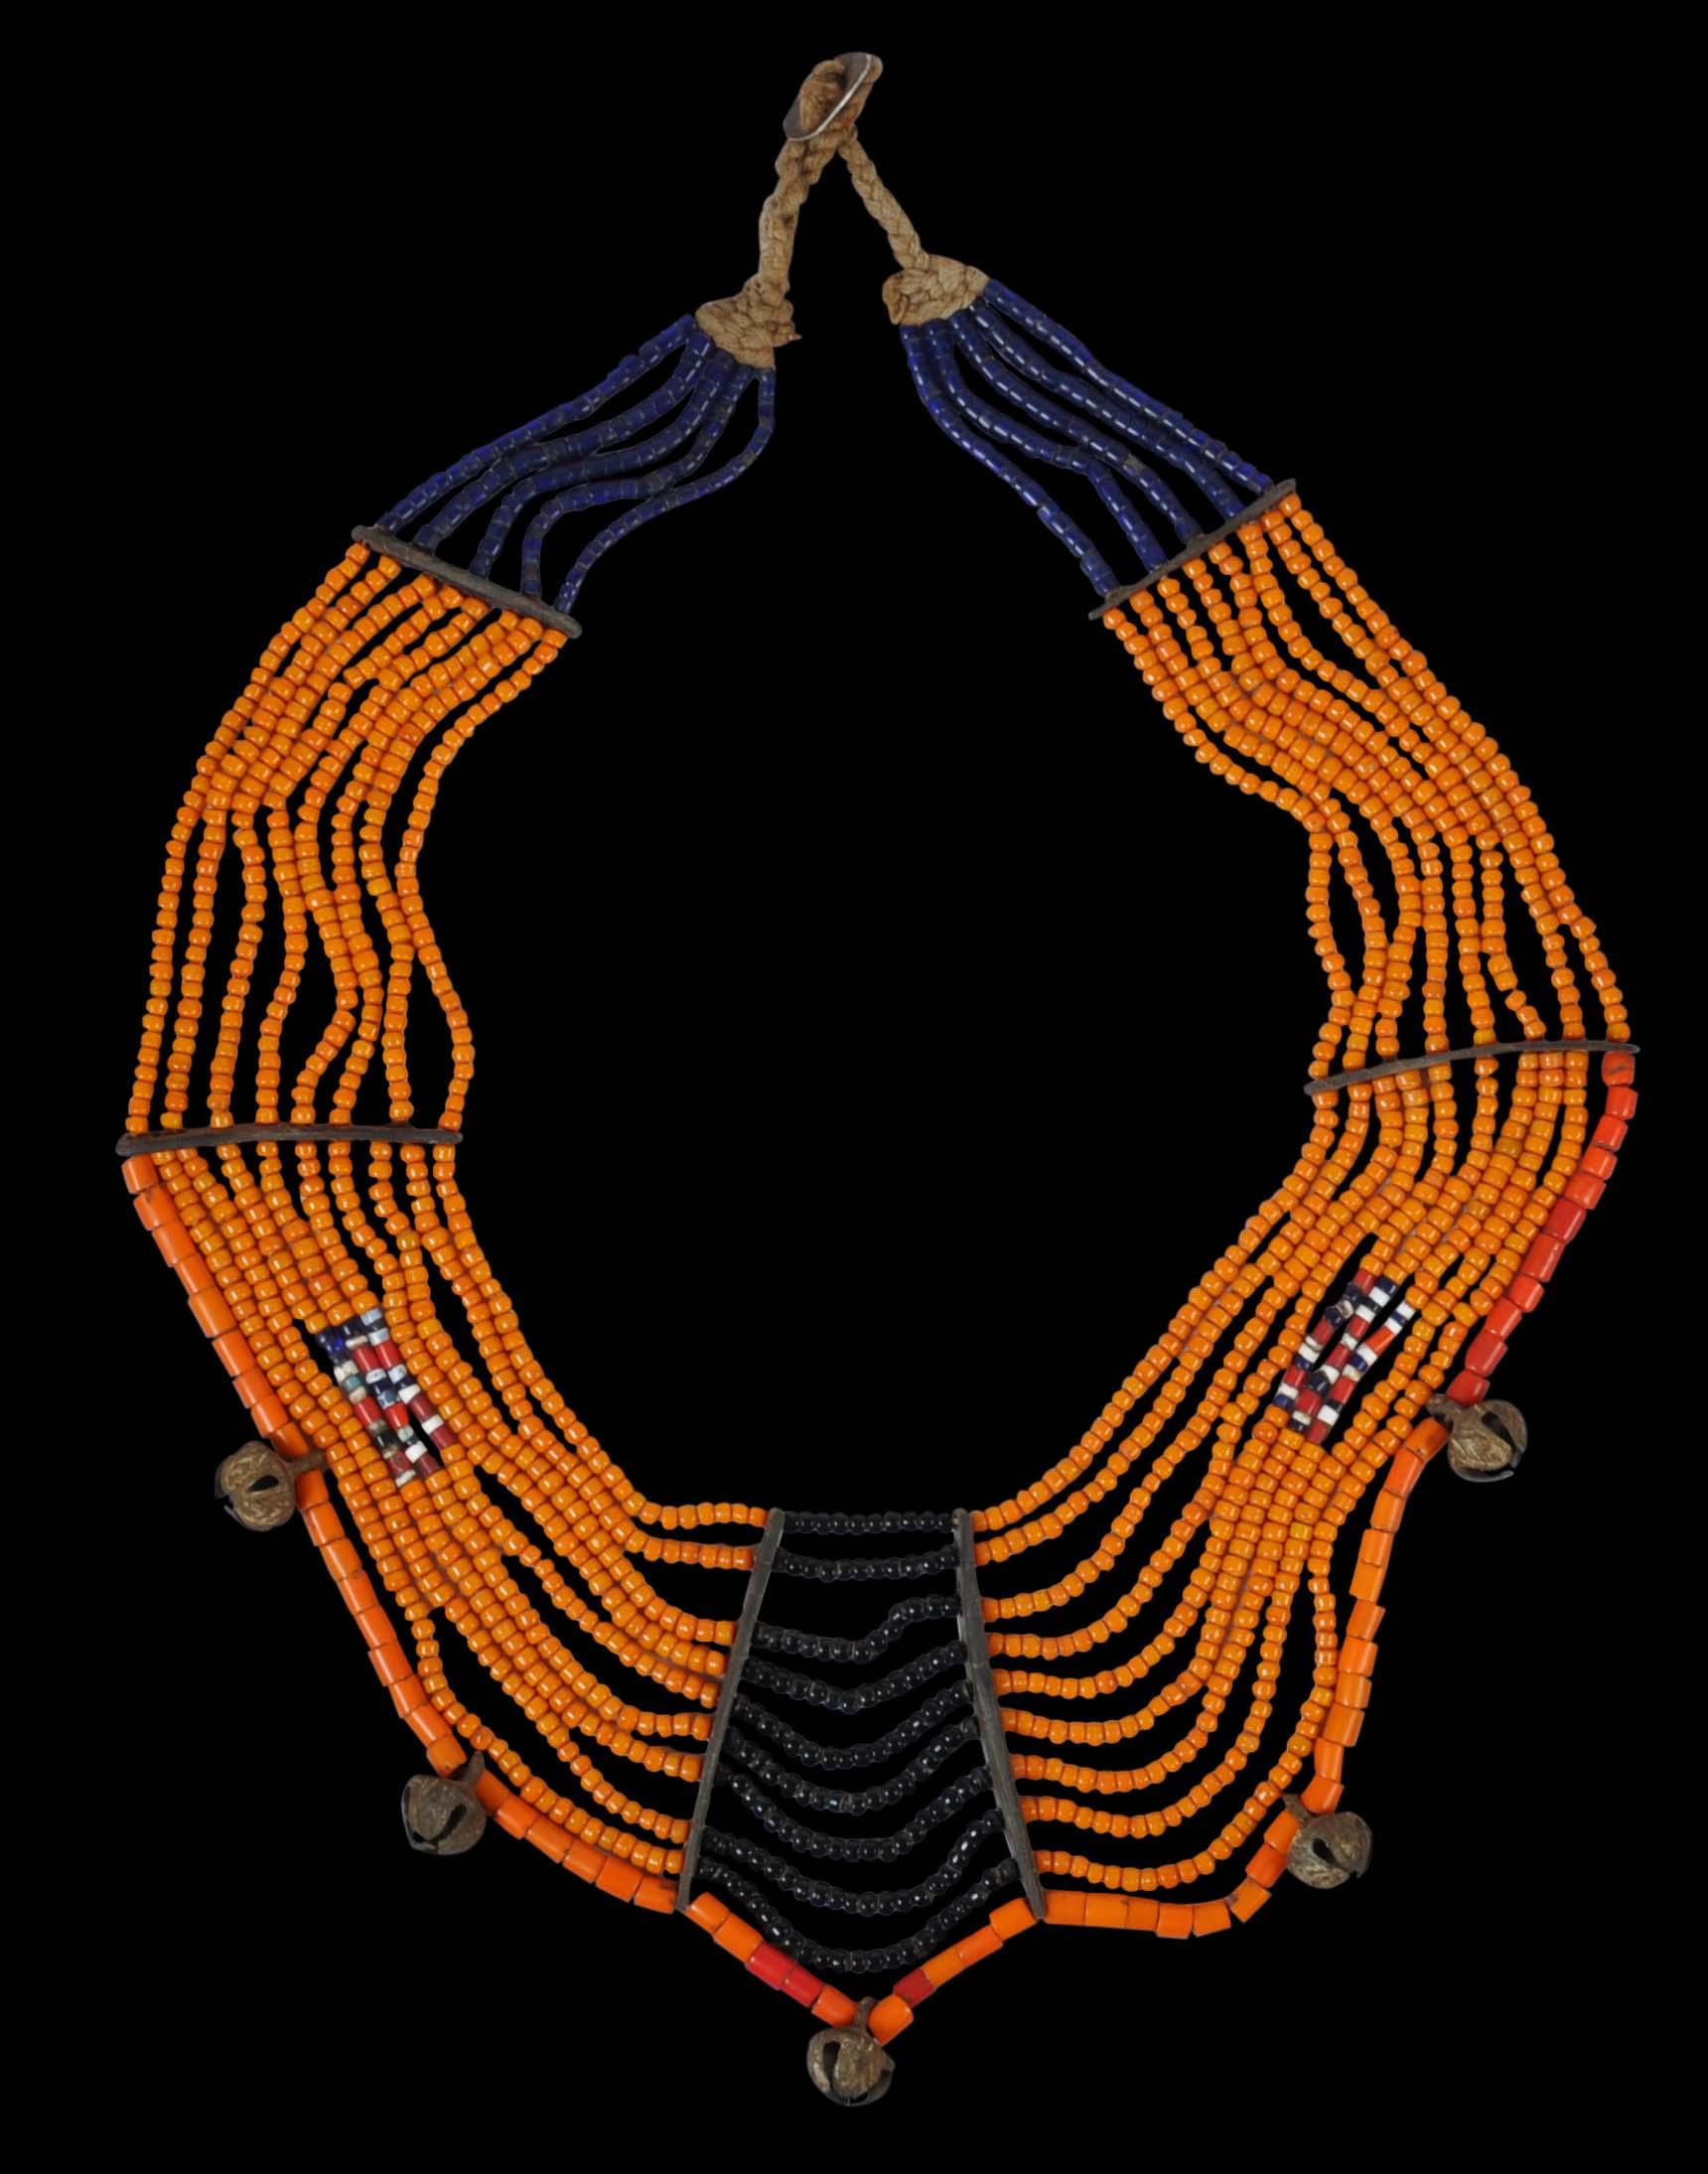 Konyak Naga Trade Bead Necklace - Michael Backman Ltd